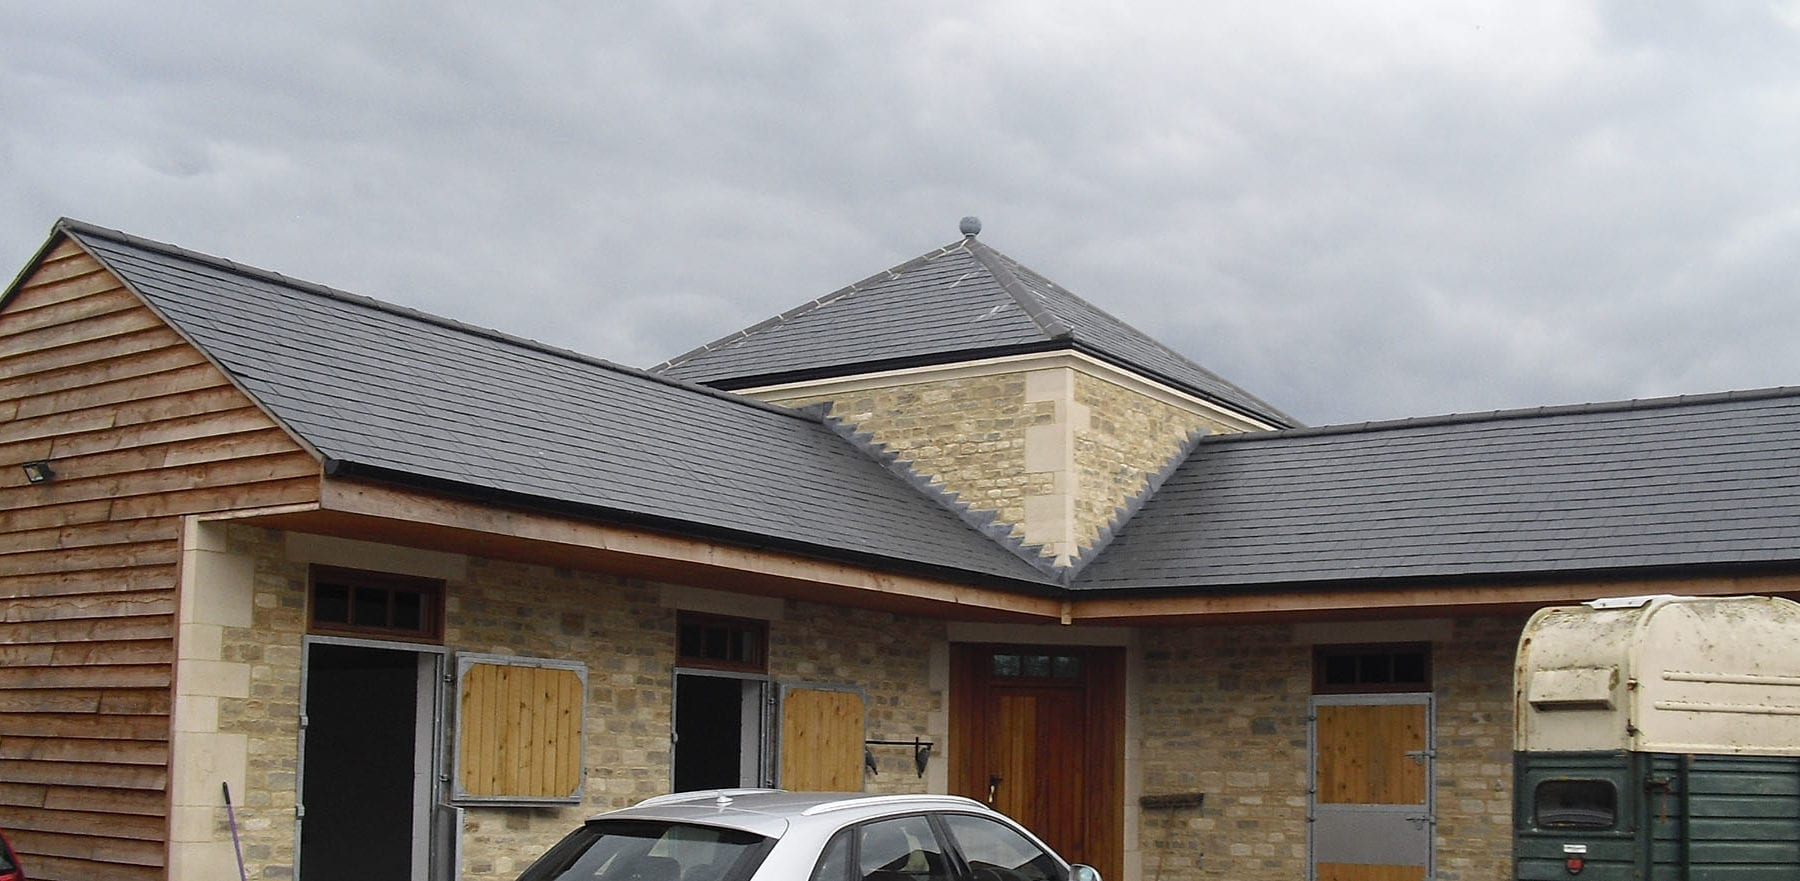 Lifestiles - Spanish Natural Slate Roof Tiles - Wiltshire, England 2